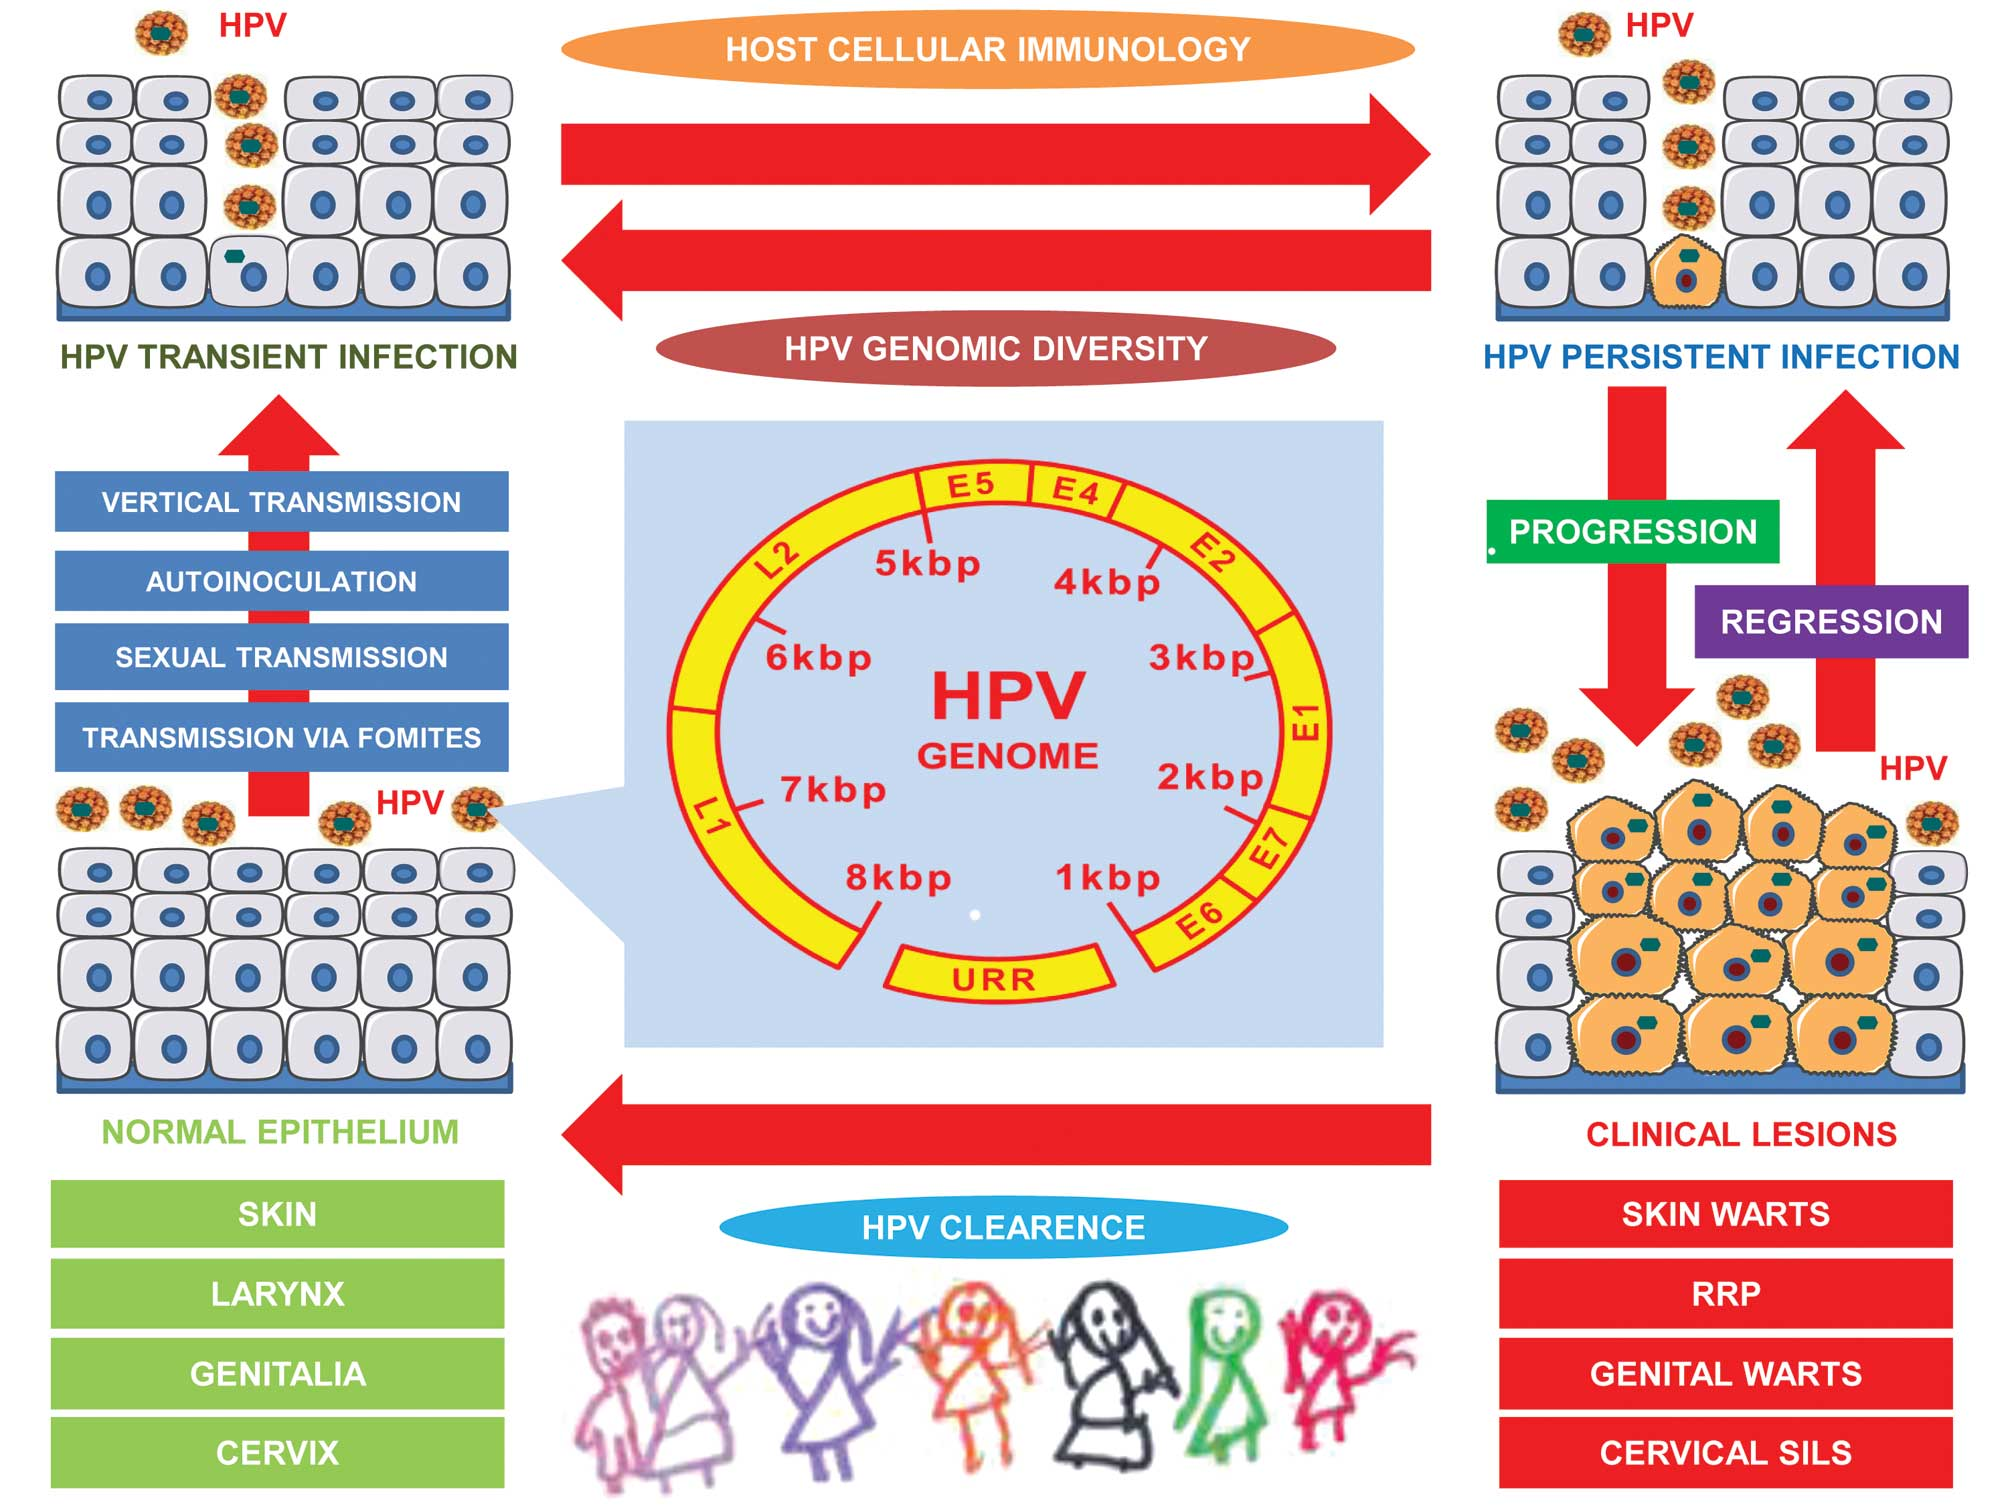 human papillomavirus and transmission gastric cancer chemotherapy